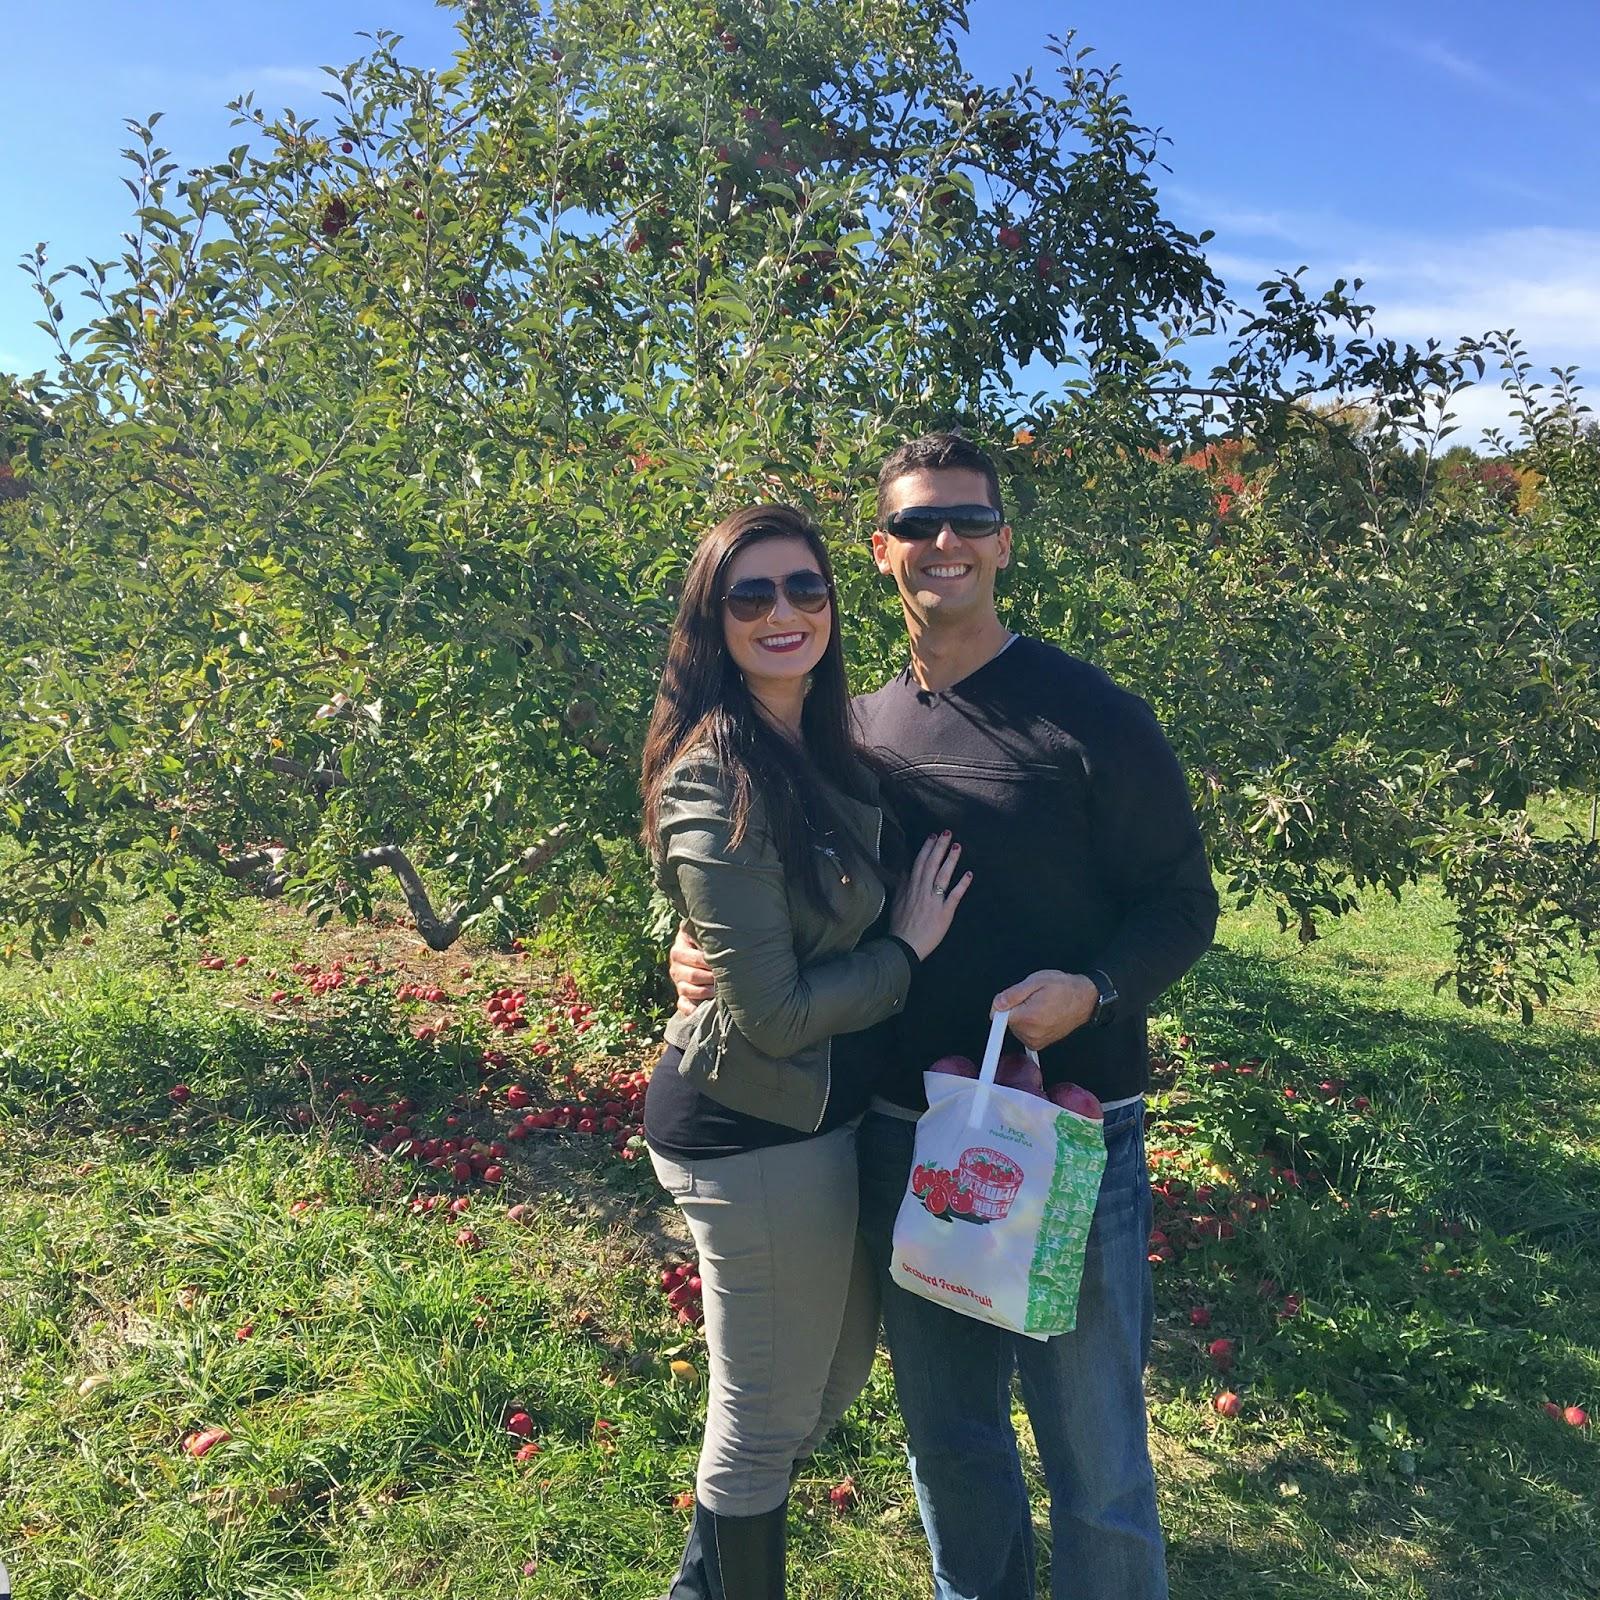 Nashoba Valley Apple Picking